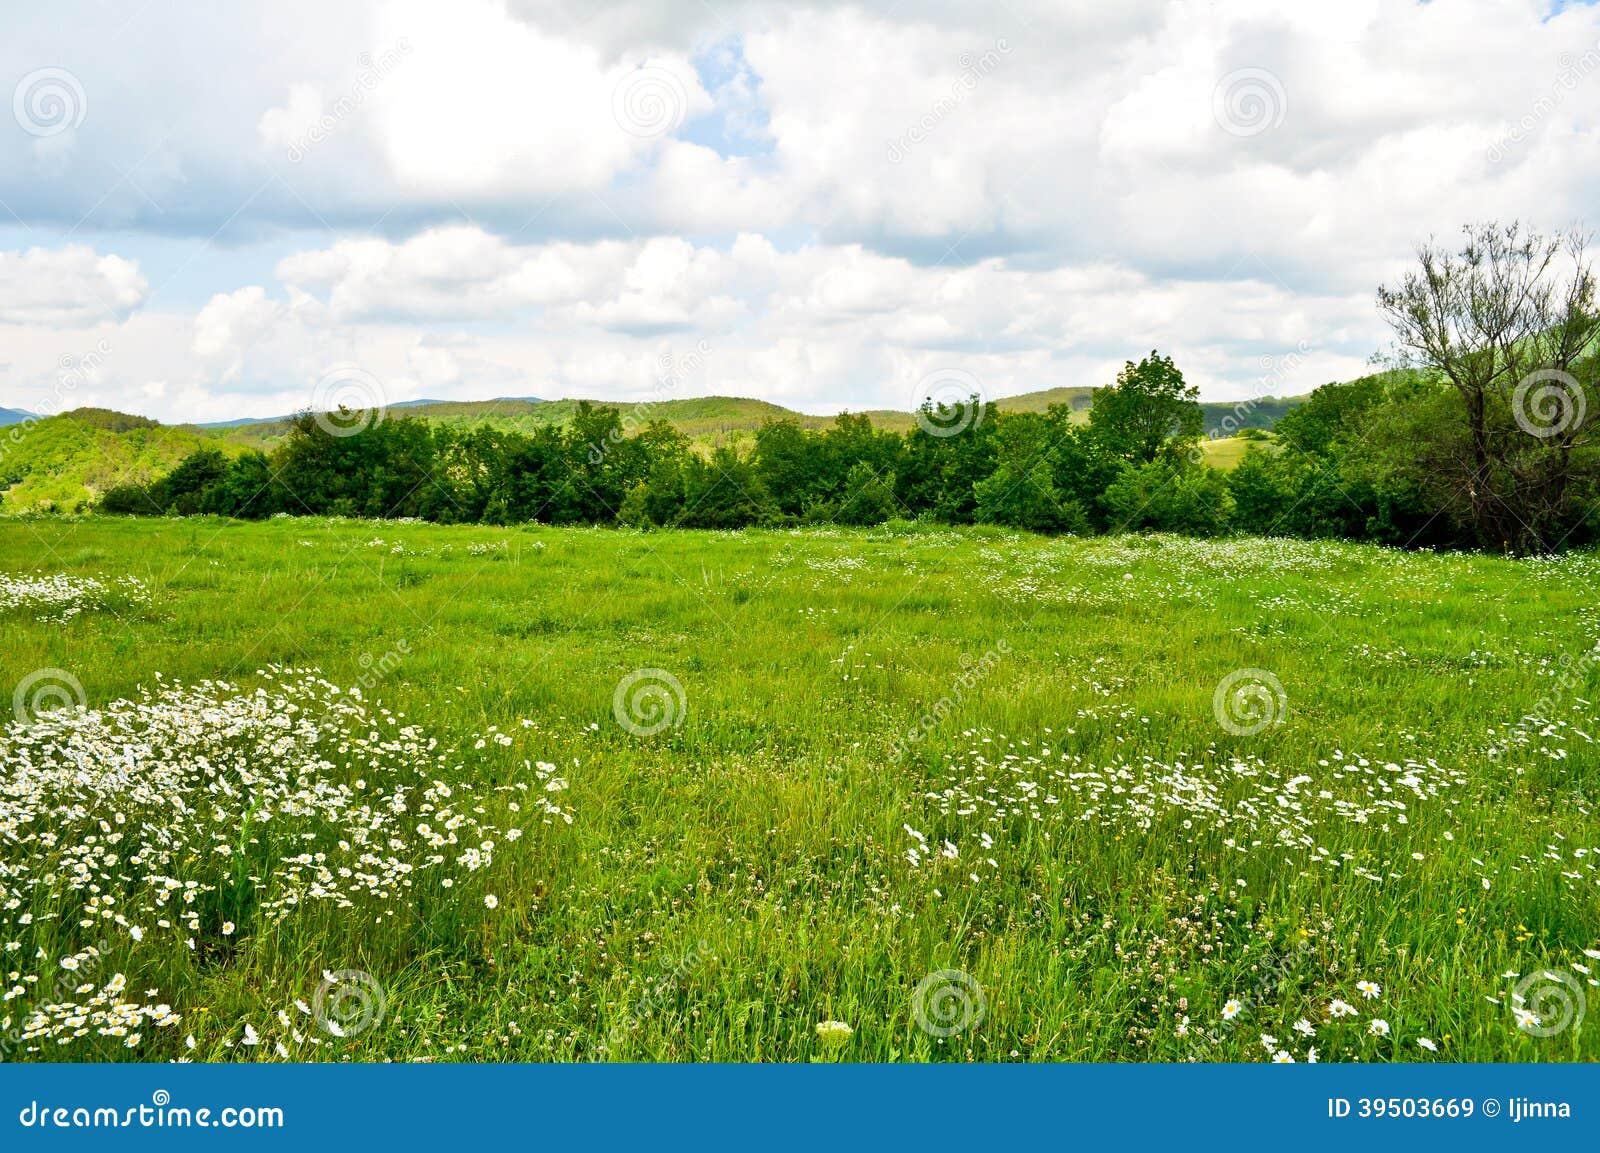 Beautiful nature view